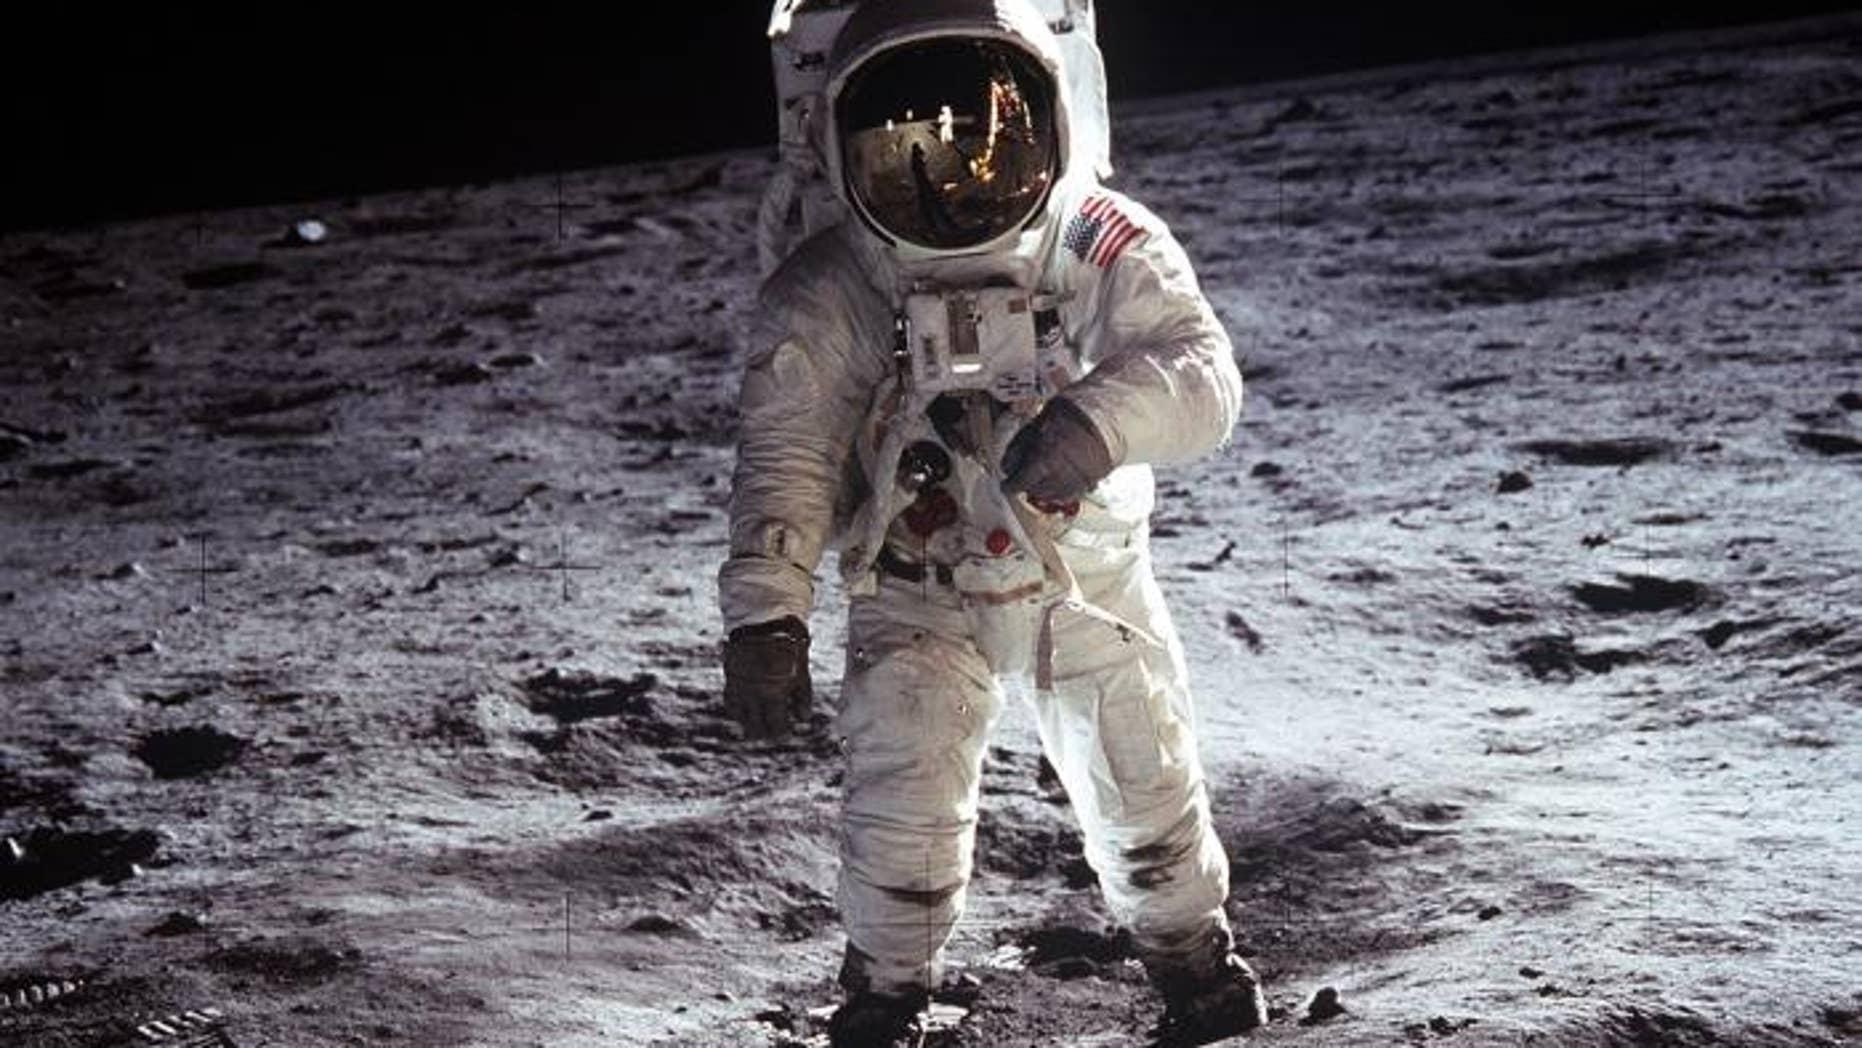 Astronauts Nasa Apollo 11 Moon Walk 8 X 10 Photo Planet Earth Plaque From Original Film D